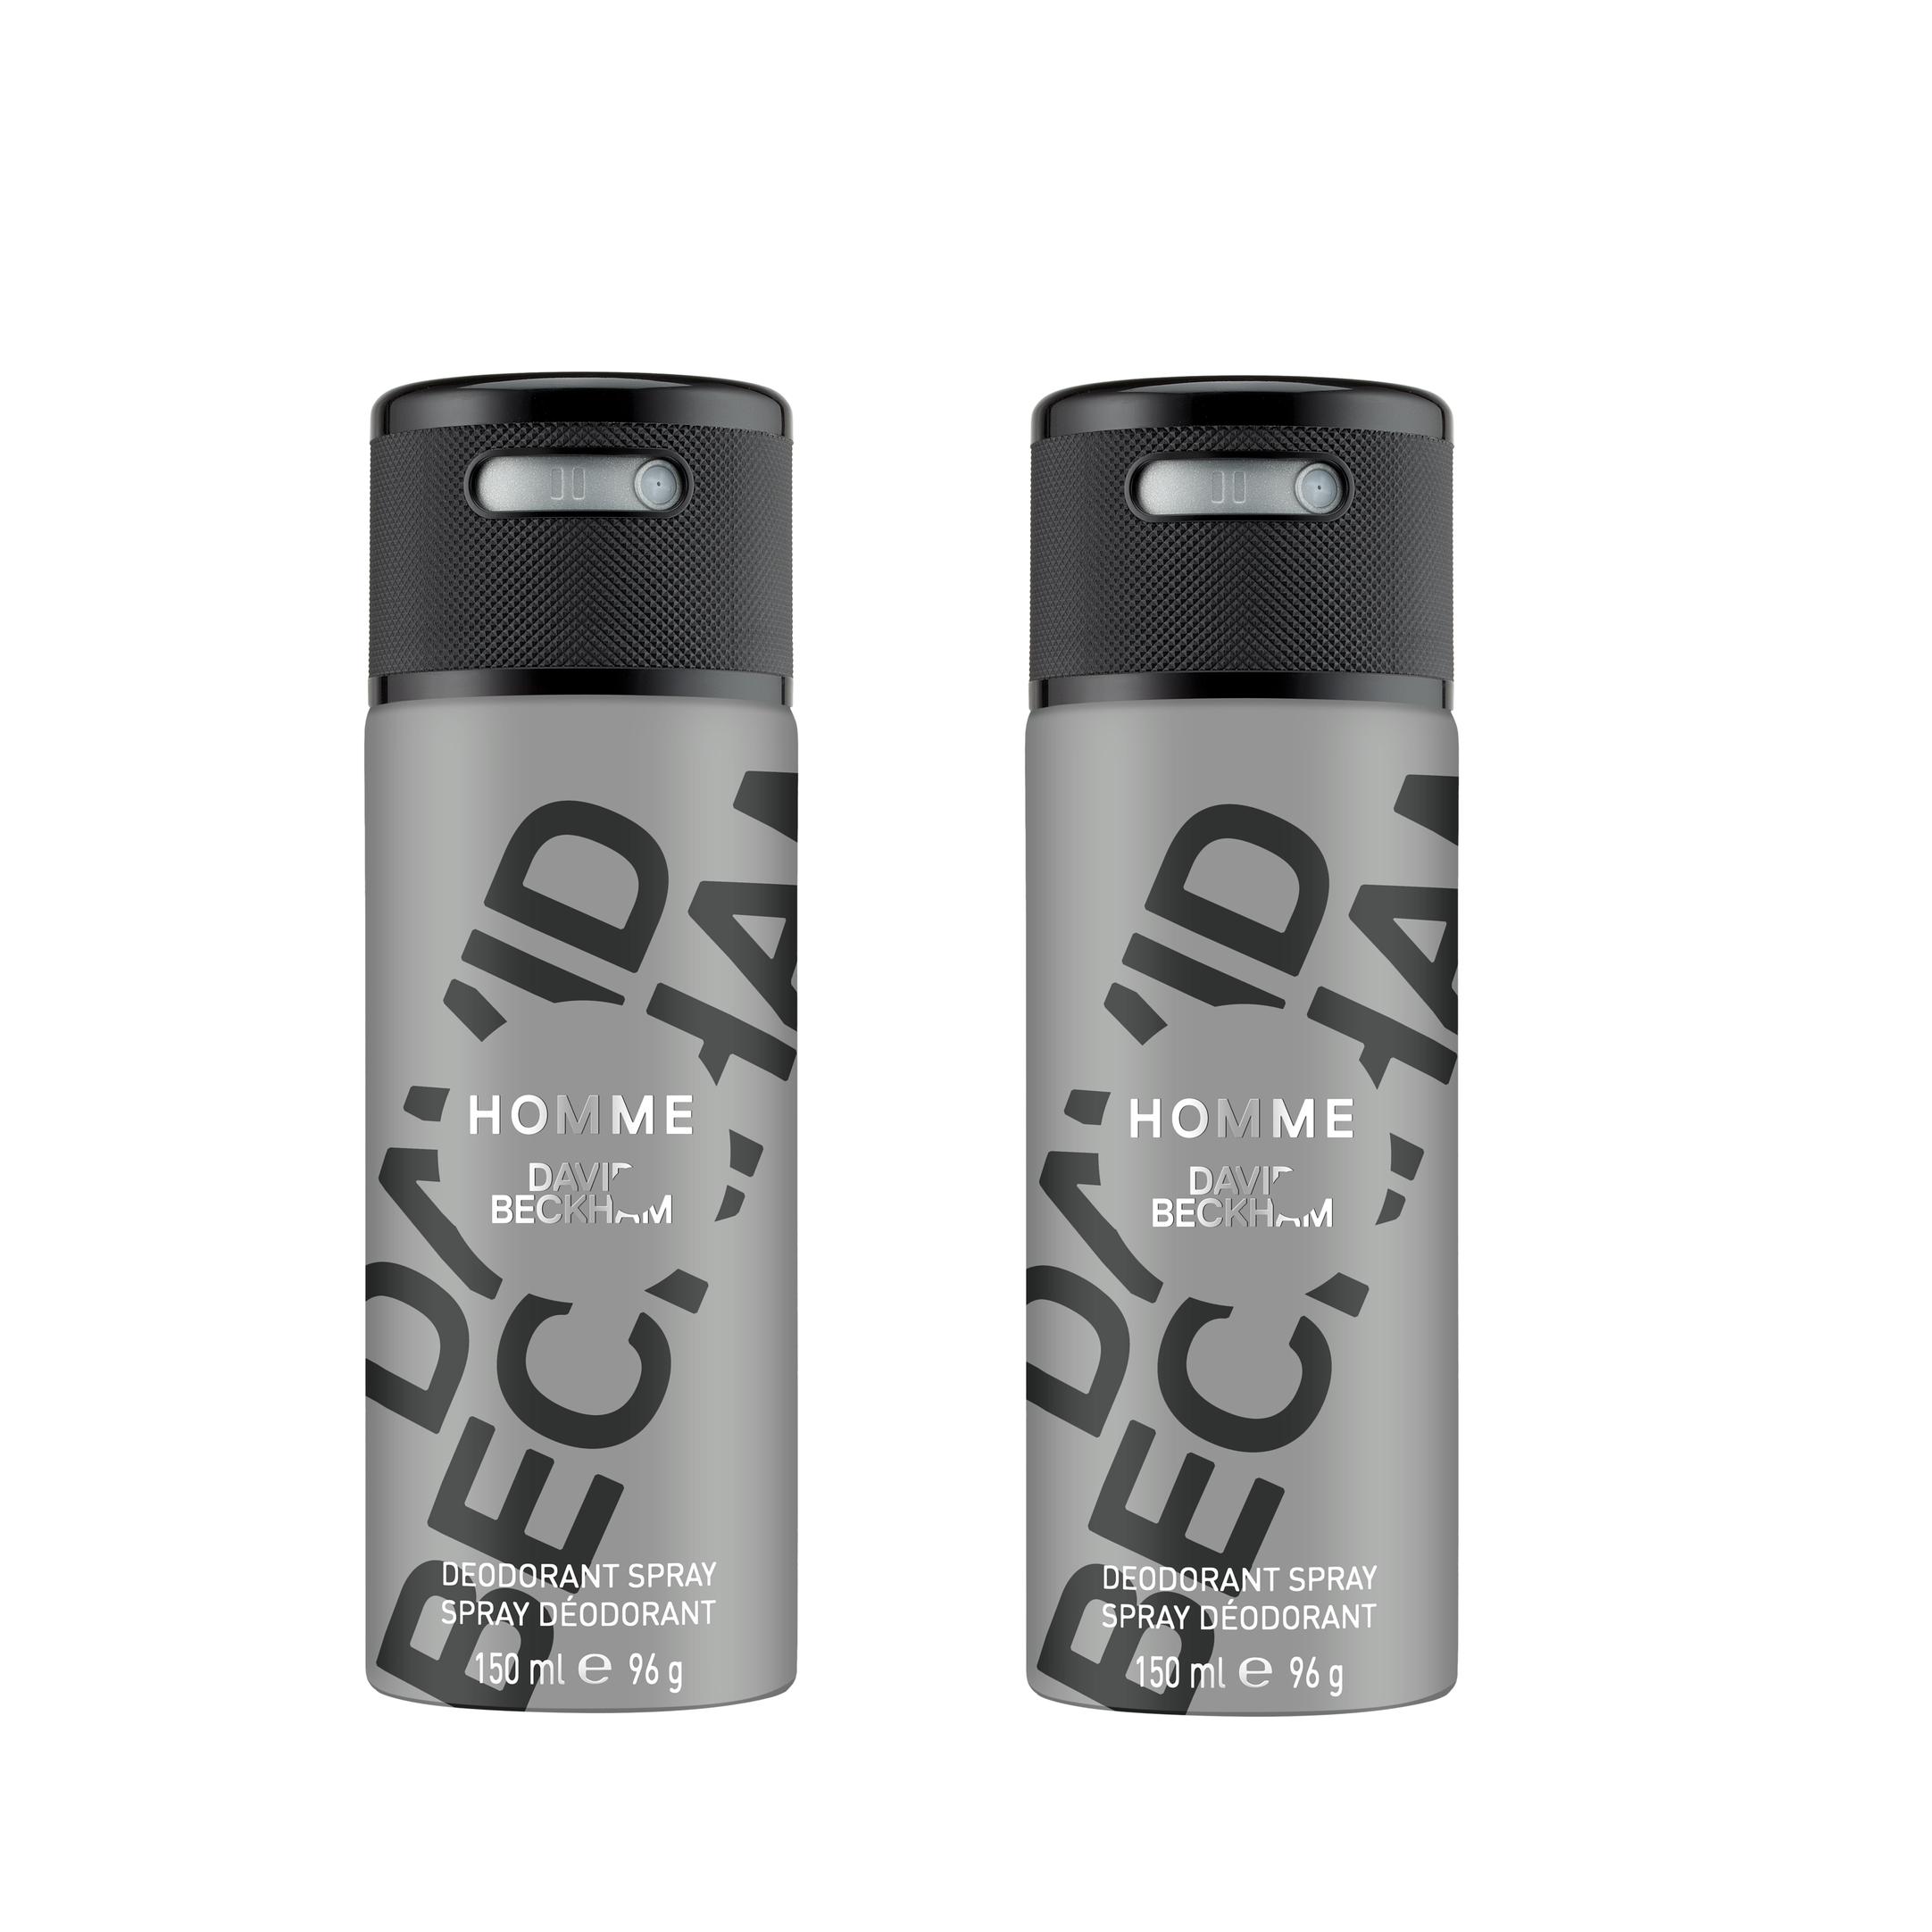 David Beckham - 2x Homme Deodorant Spray 150 ml